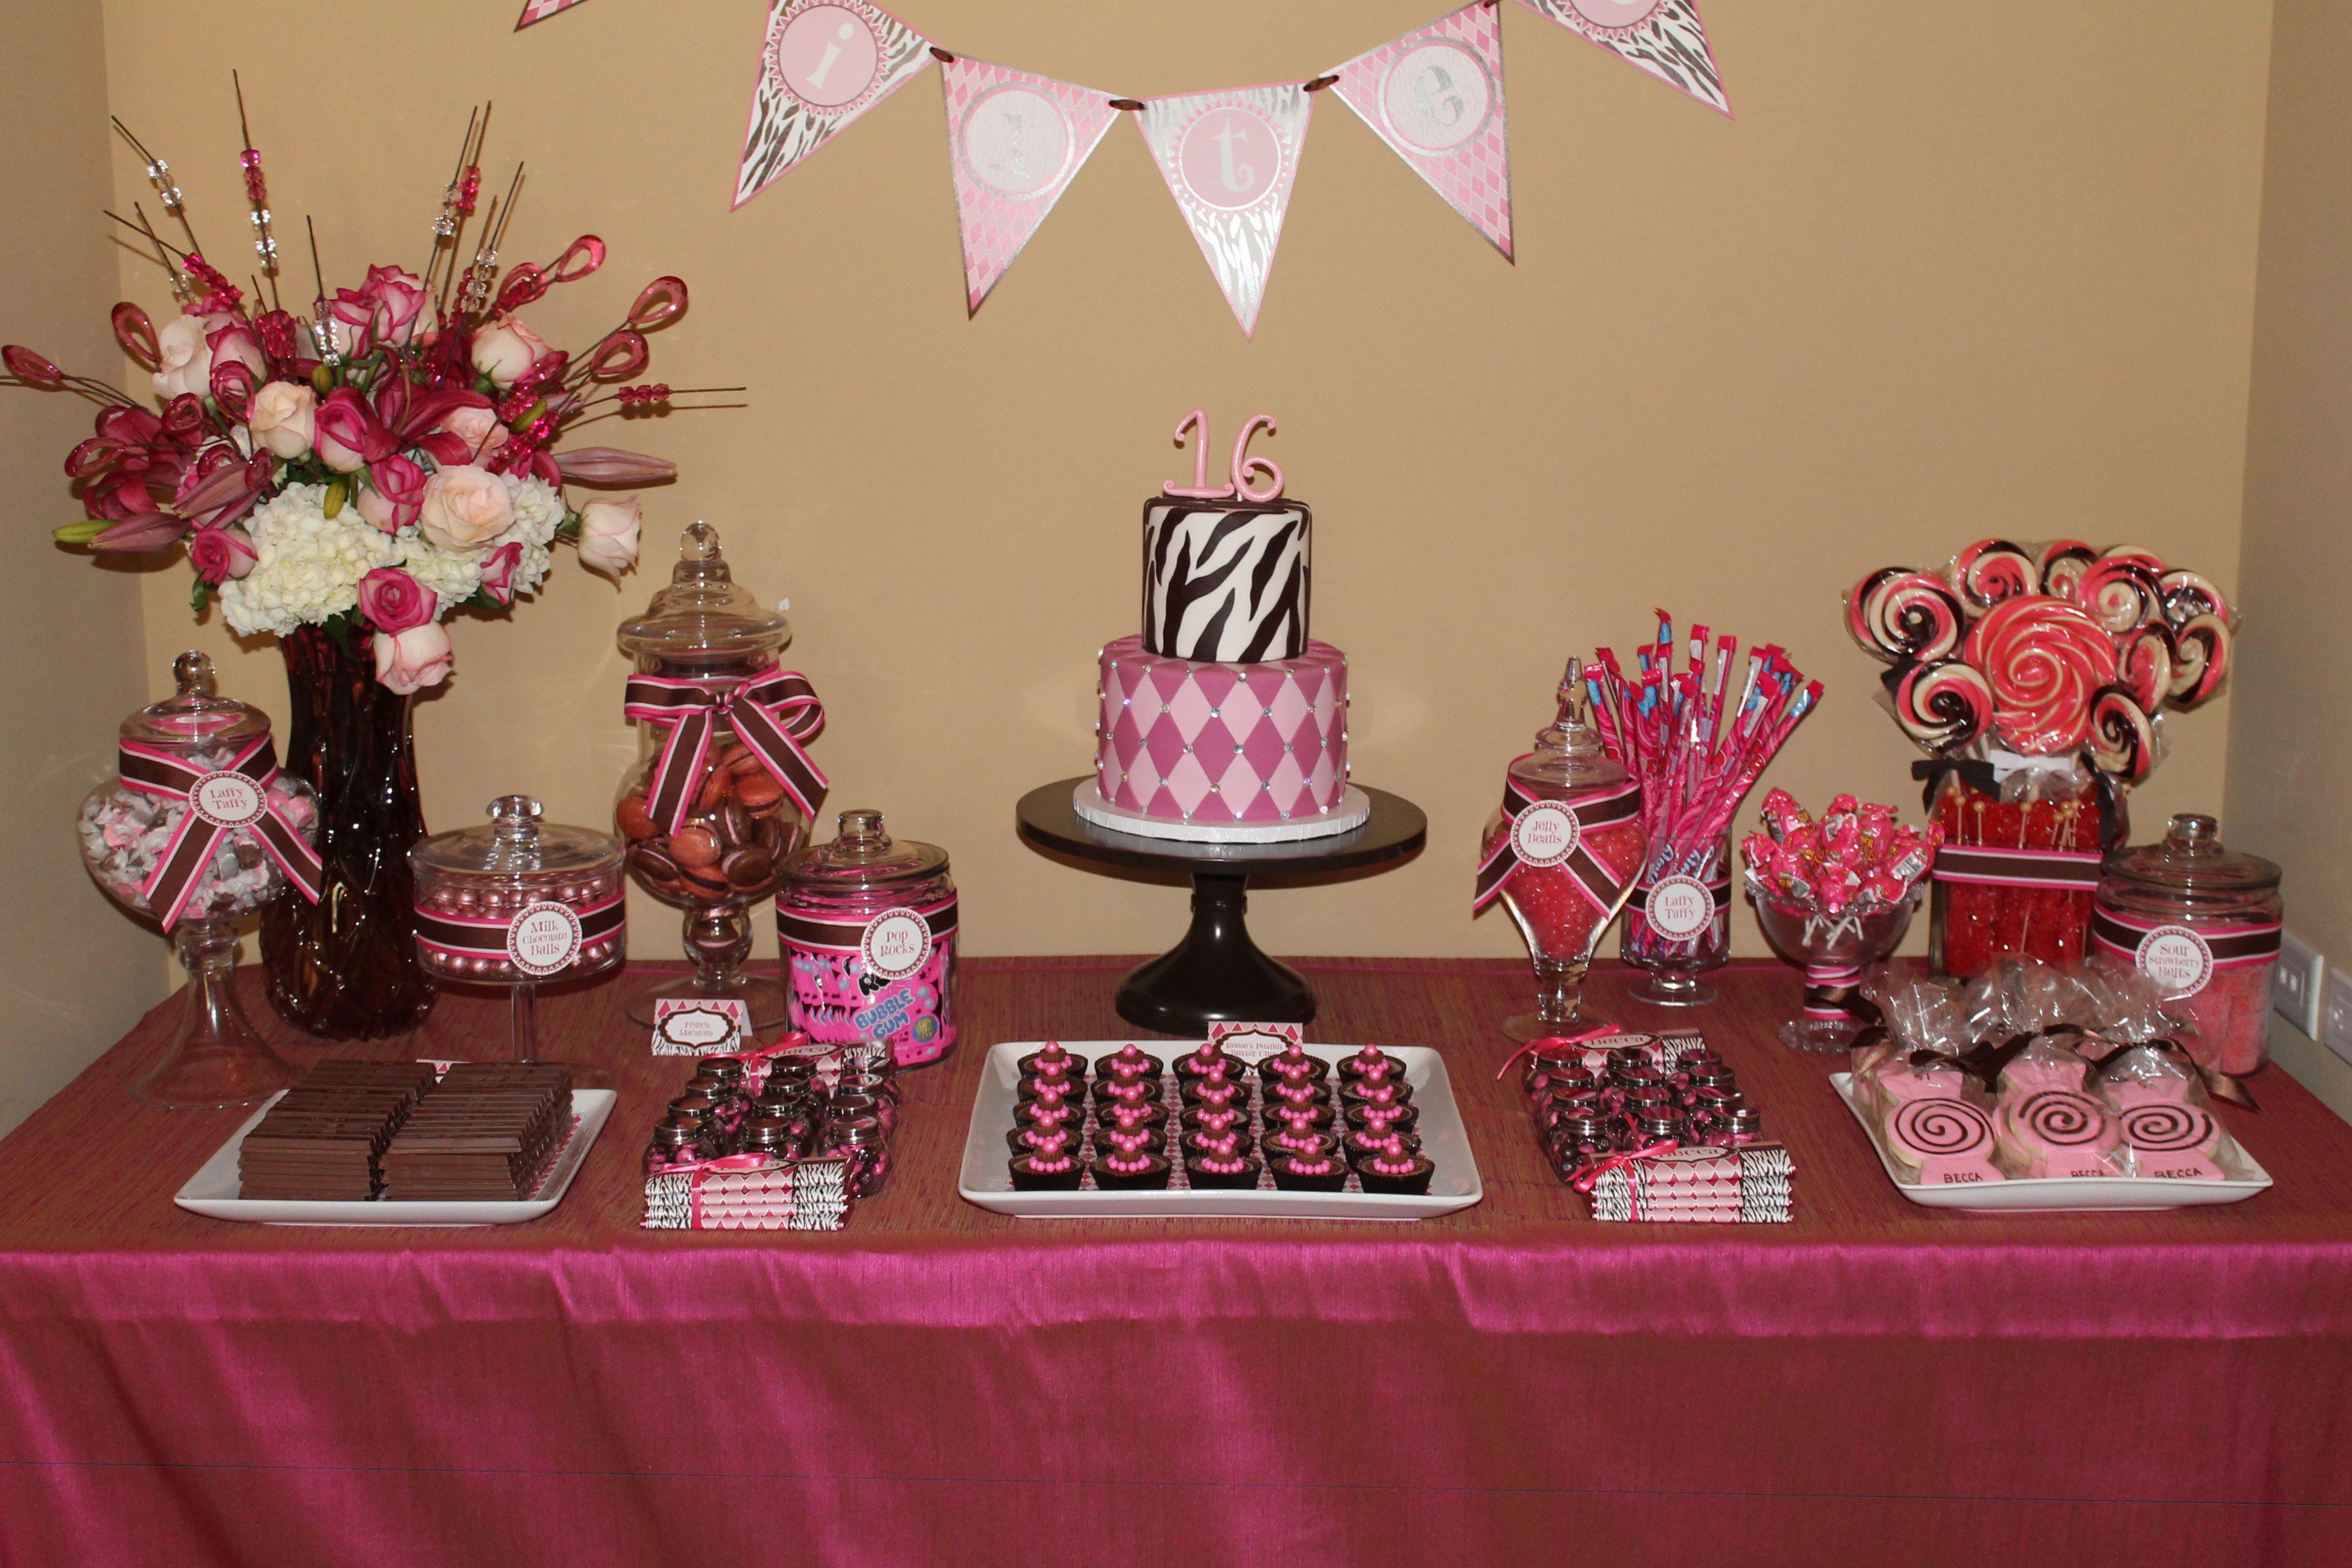 Candy buffet ideas for sweet sixteen - Sweet Sixteen Candy Bar Sweet 16 Pink Brown Dessert Table Debbie Kennedy Events